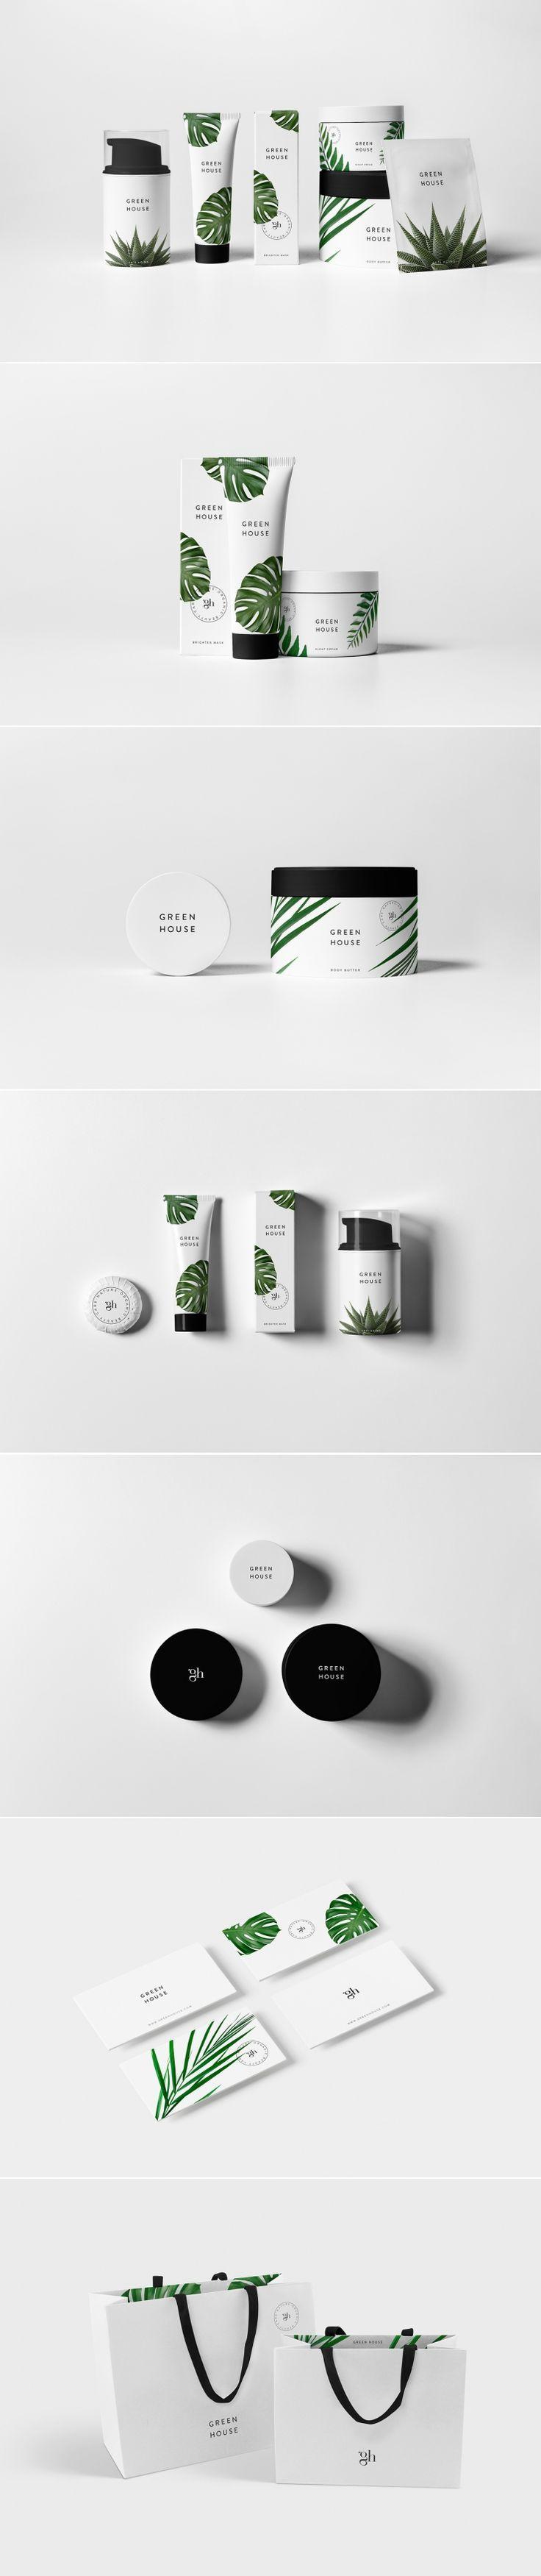 Green House brand identity